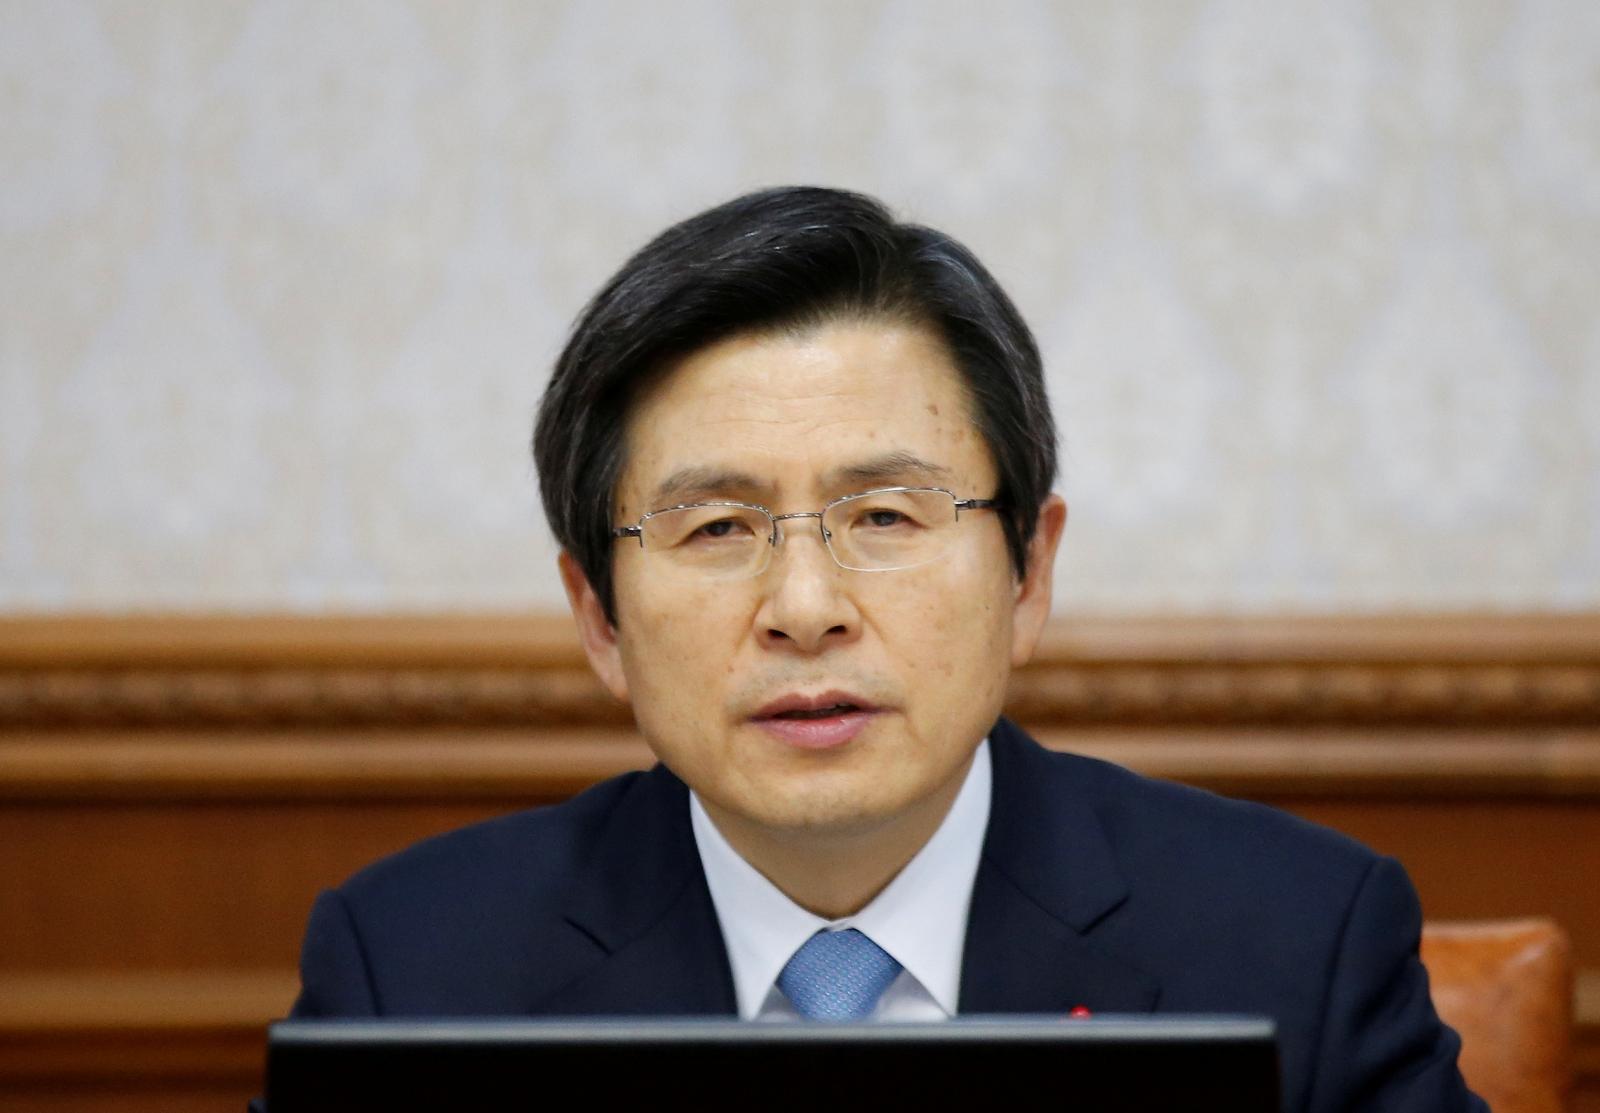 South Korea's Prime Minister Hwang Kyo-ahn